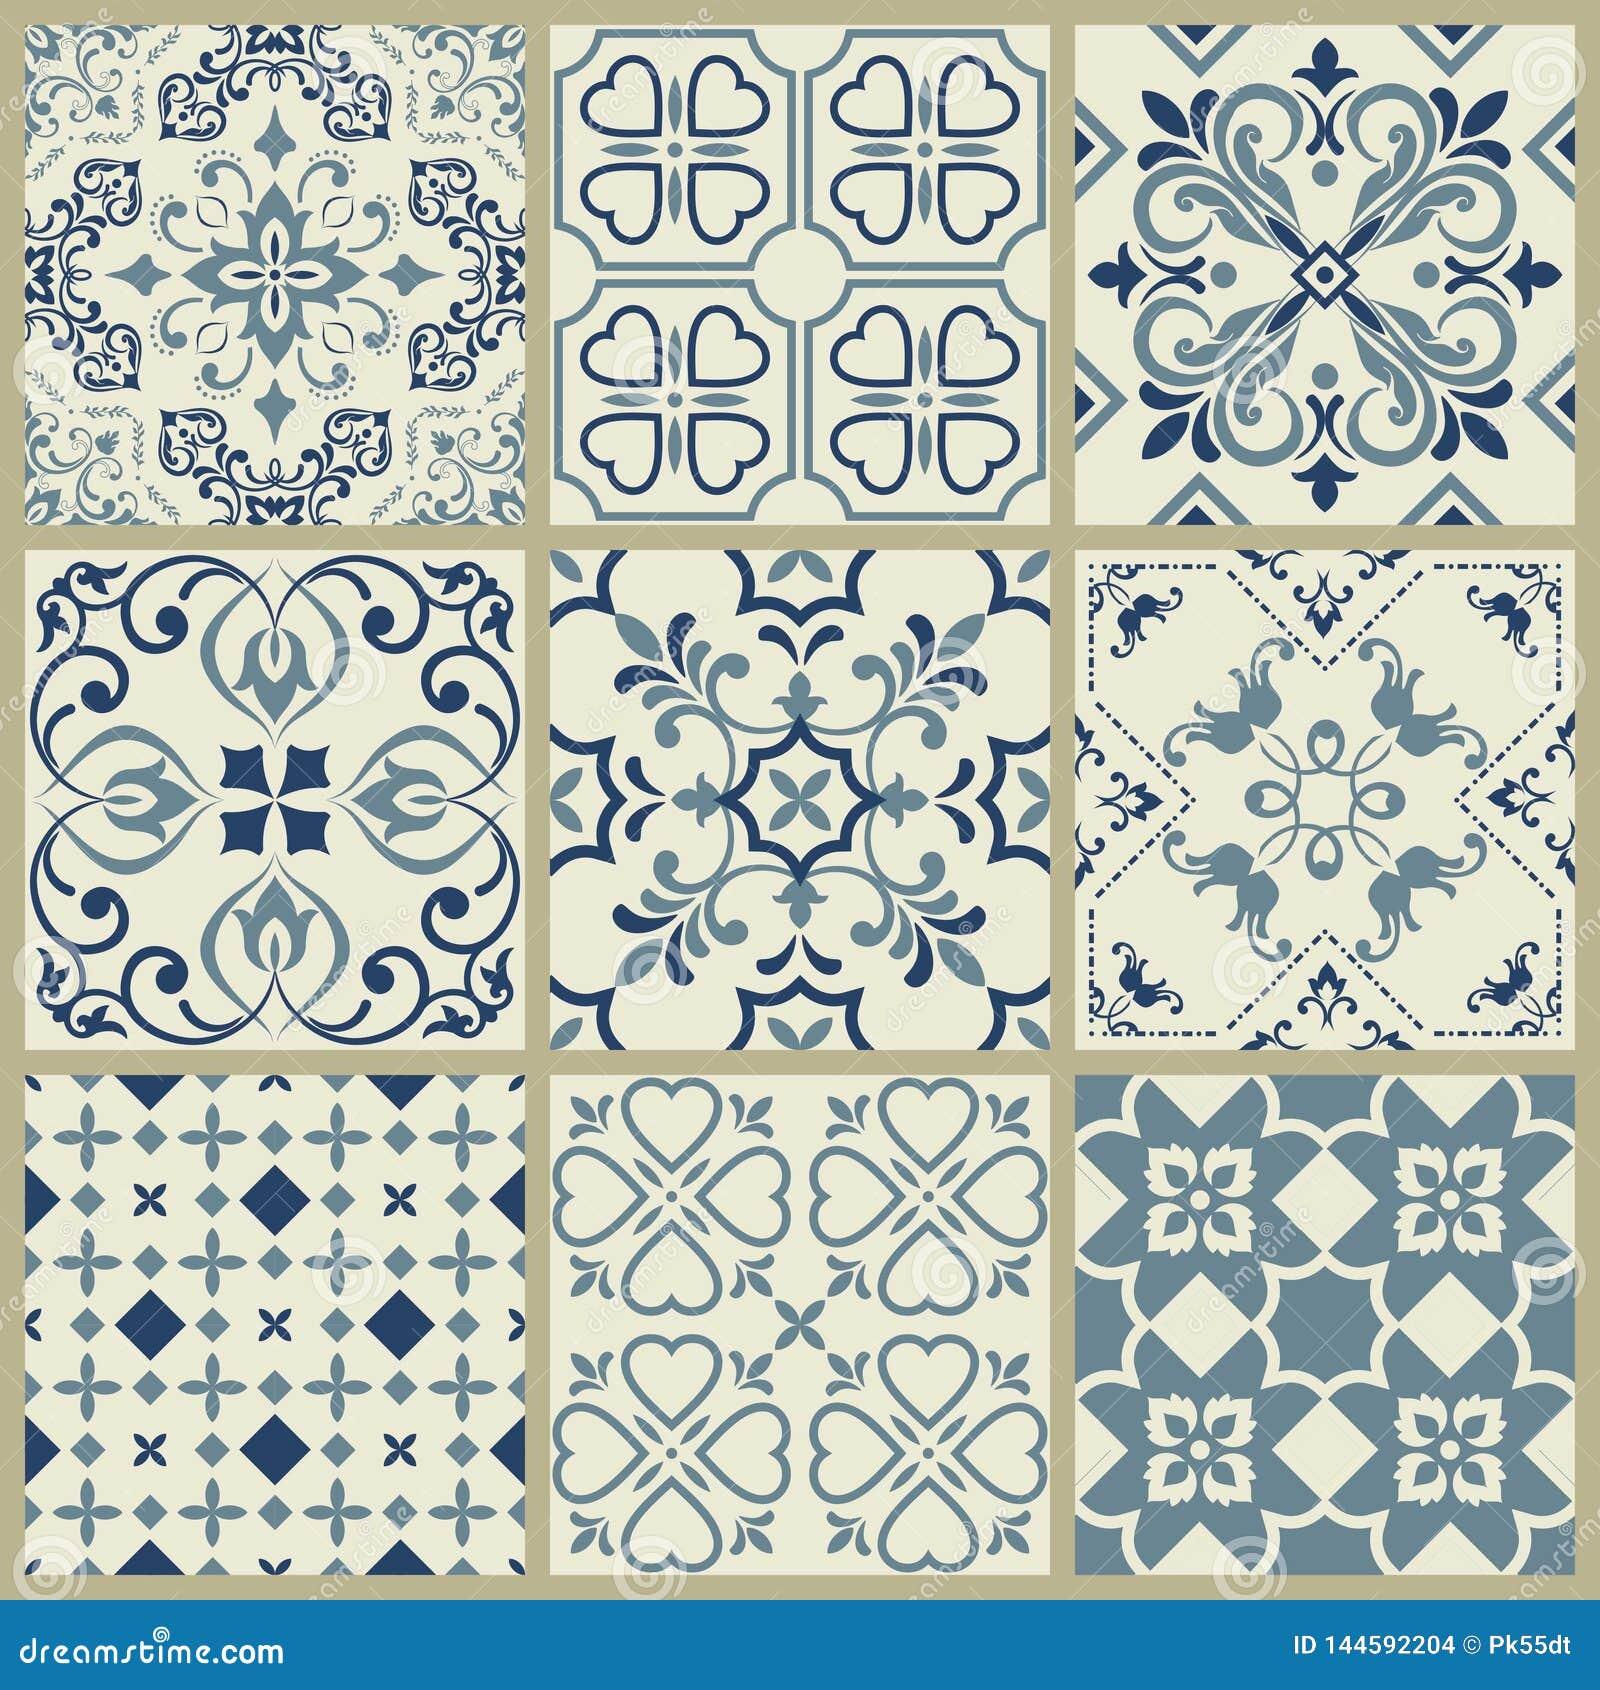 Spanish or Portuguese vector tile pattern, Lisbon floral mosaic, Mediterranean seamless navy blue ornament.Ornamental tile